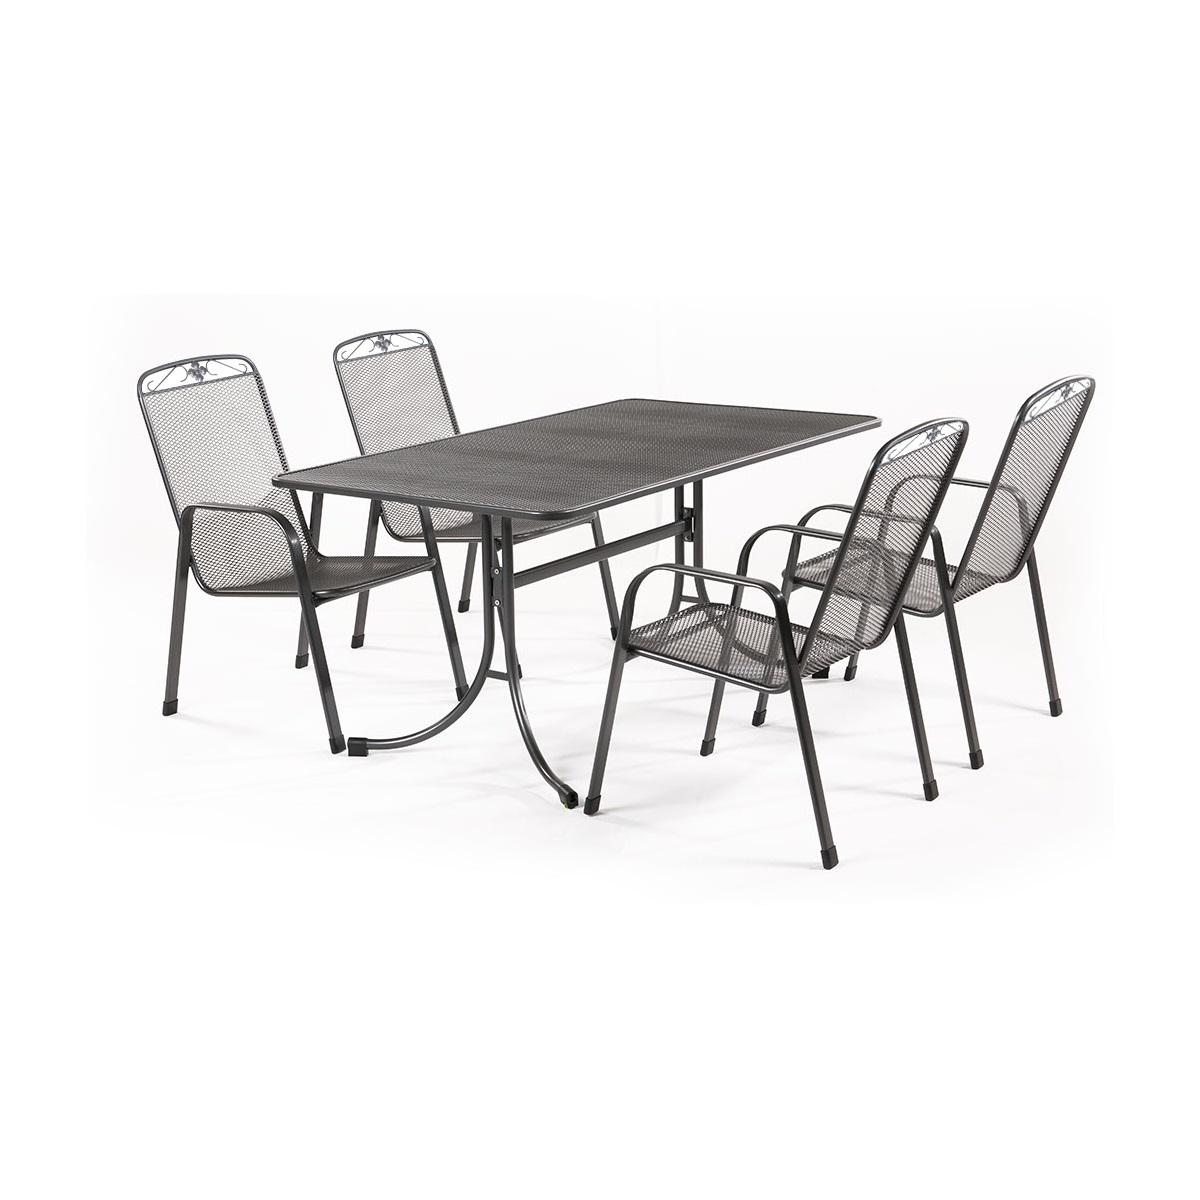 sestava nábytku z tahokovu (4x židle Savoy, 1x stůl Universal 145) MWH Banis 4+